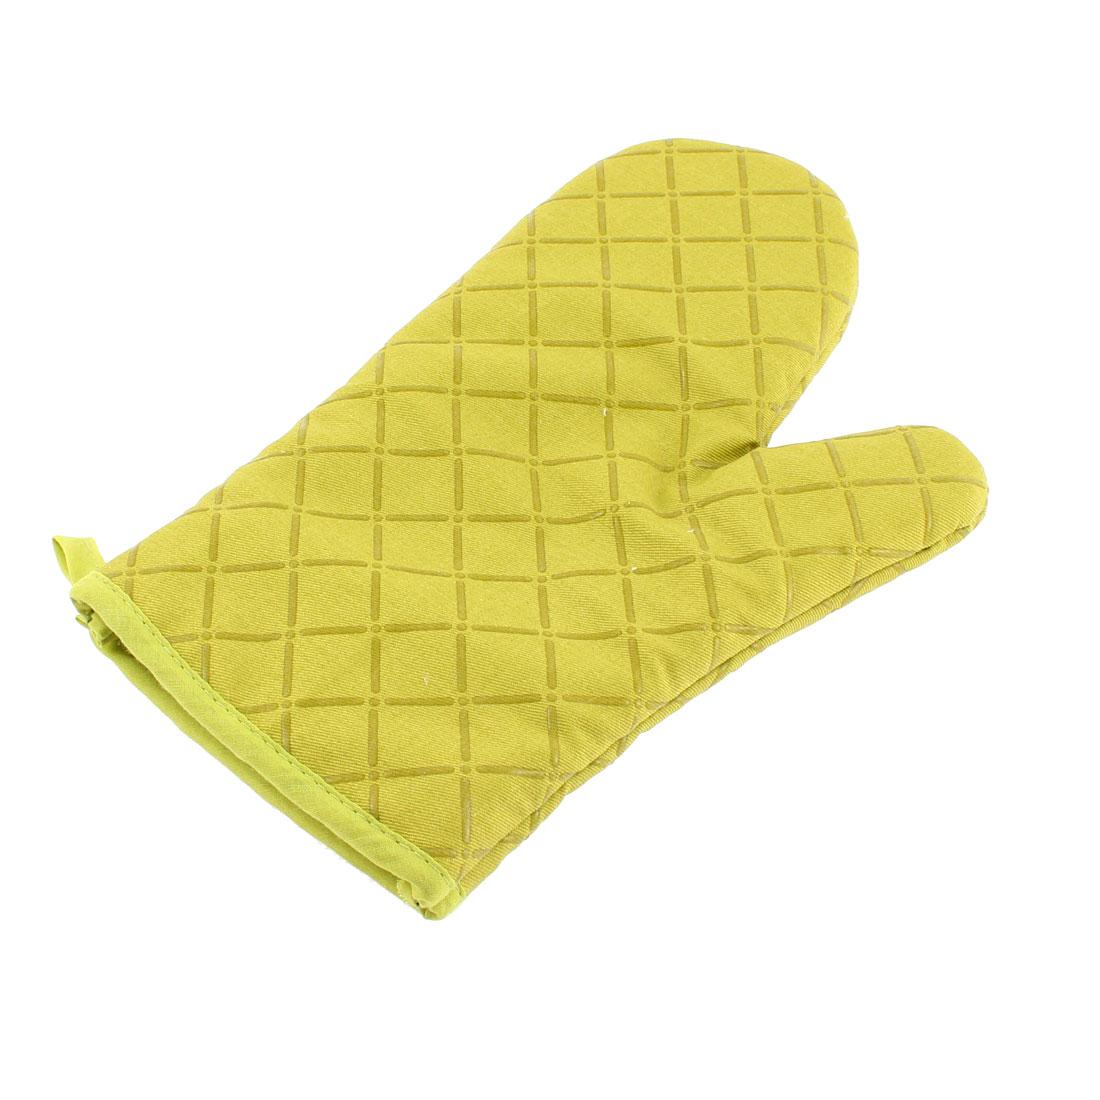 Kitchen Microwave Baking Cross Pattern Heat Resistance Mitten Glove Green